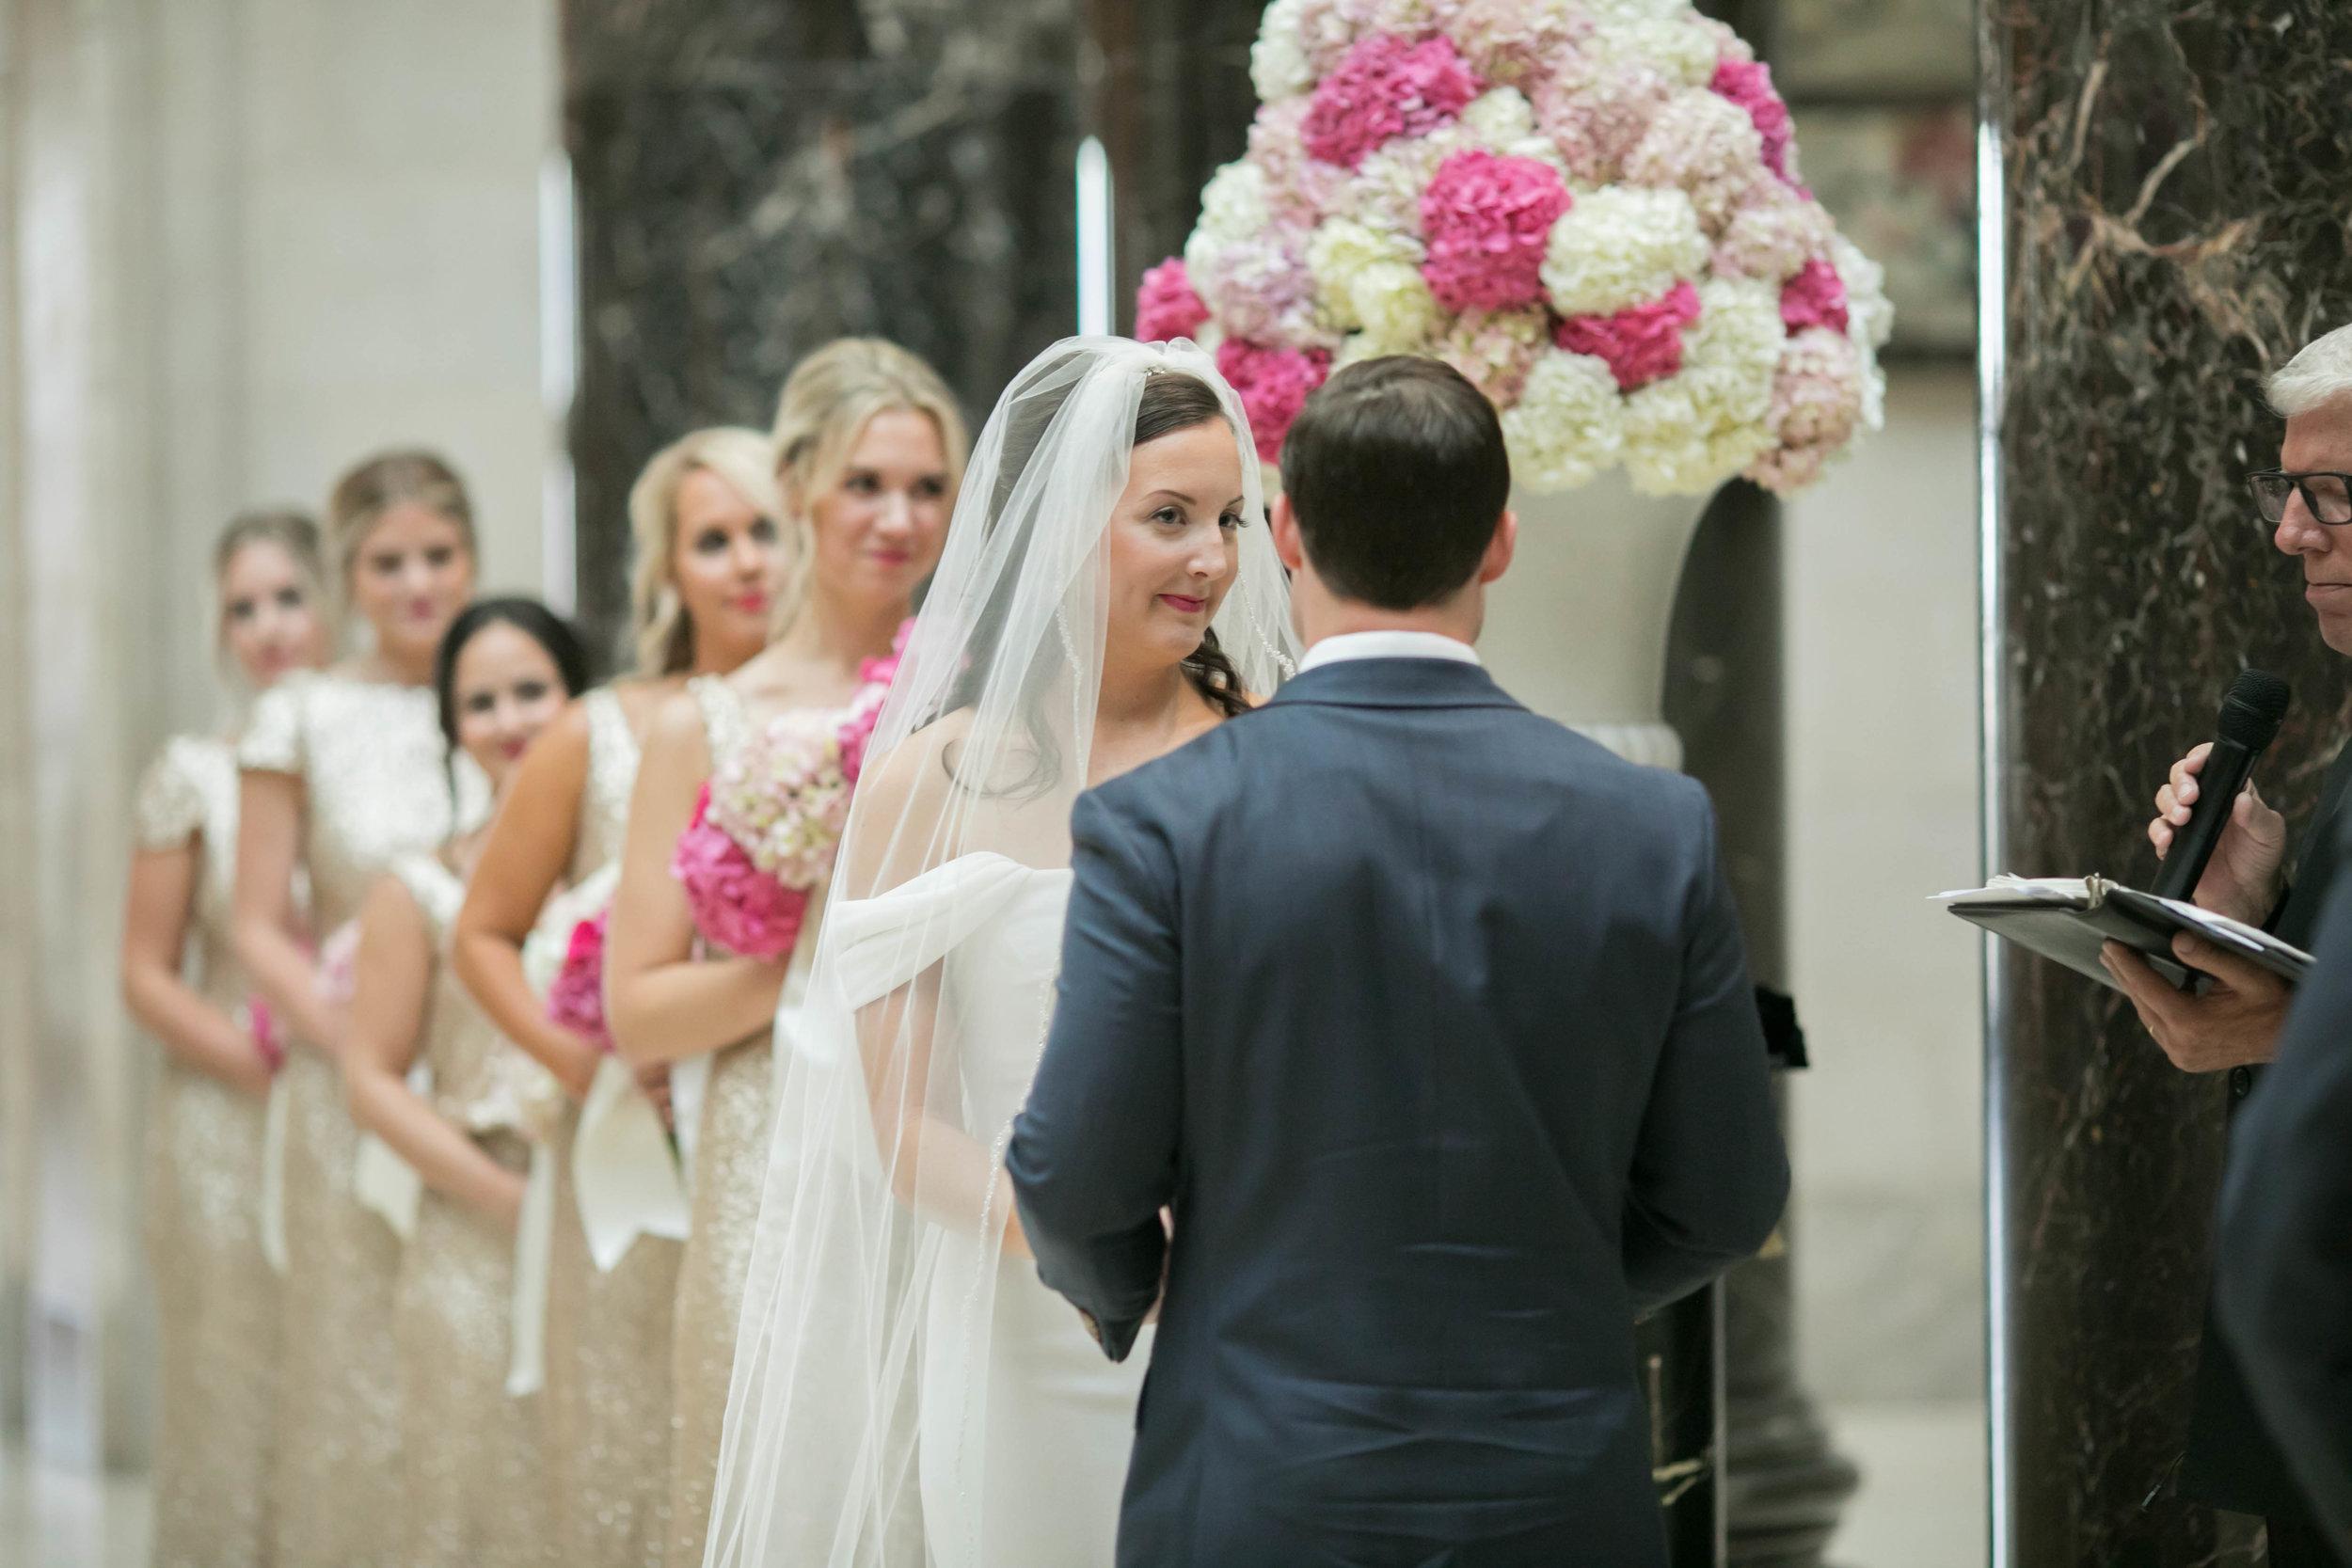 nelson-atkins-wedding-38.jpg